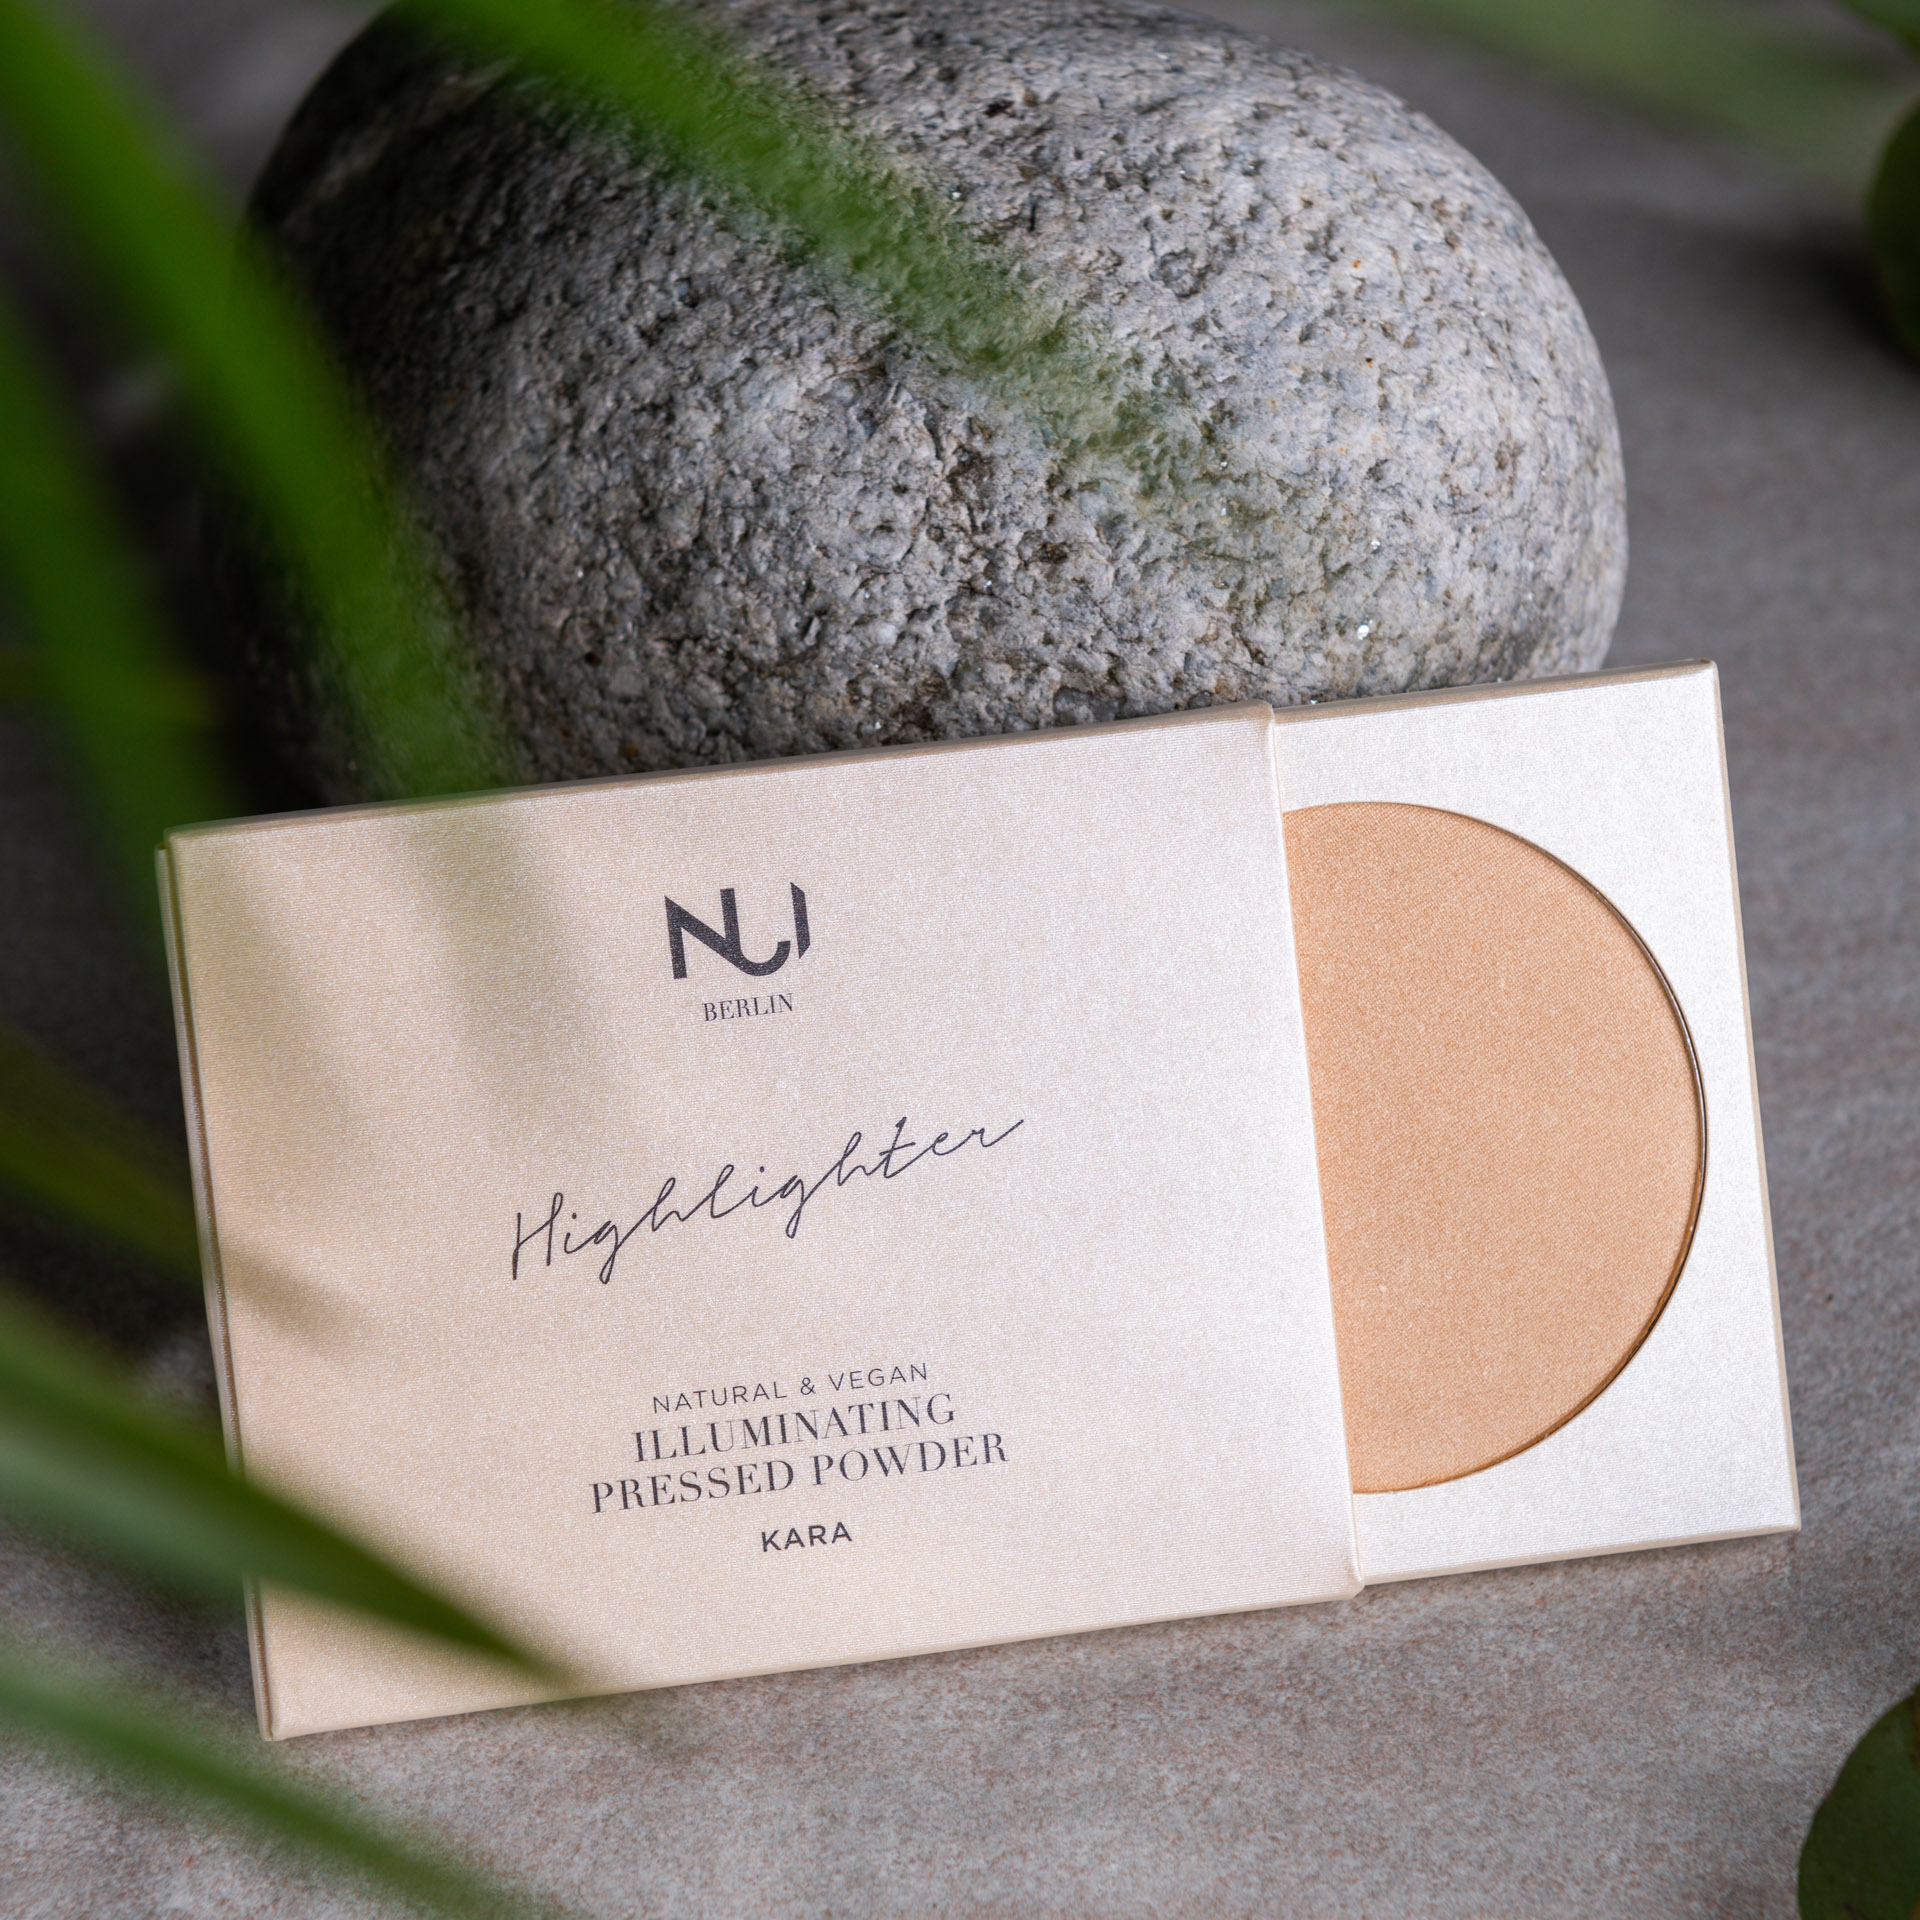 NUI Natural Illuminating Pressed Powder KARA